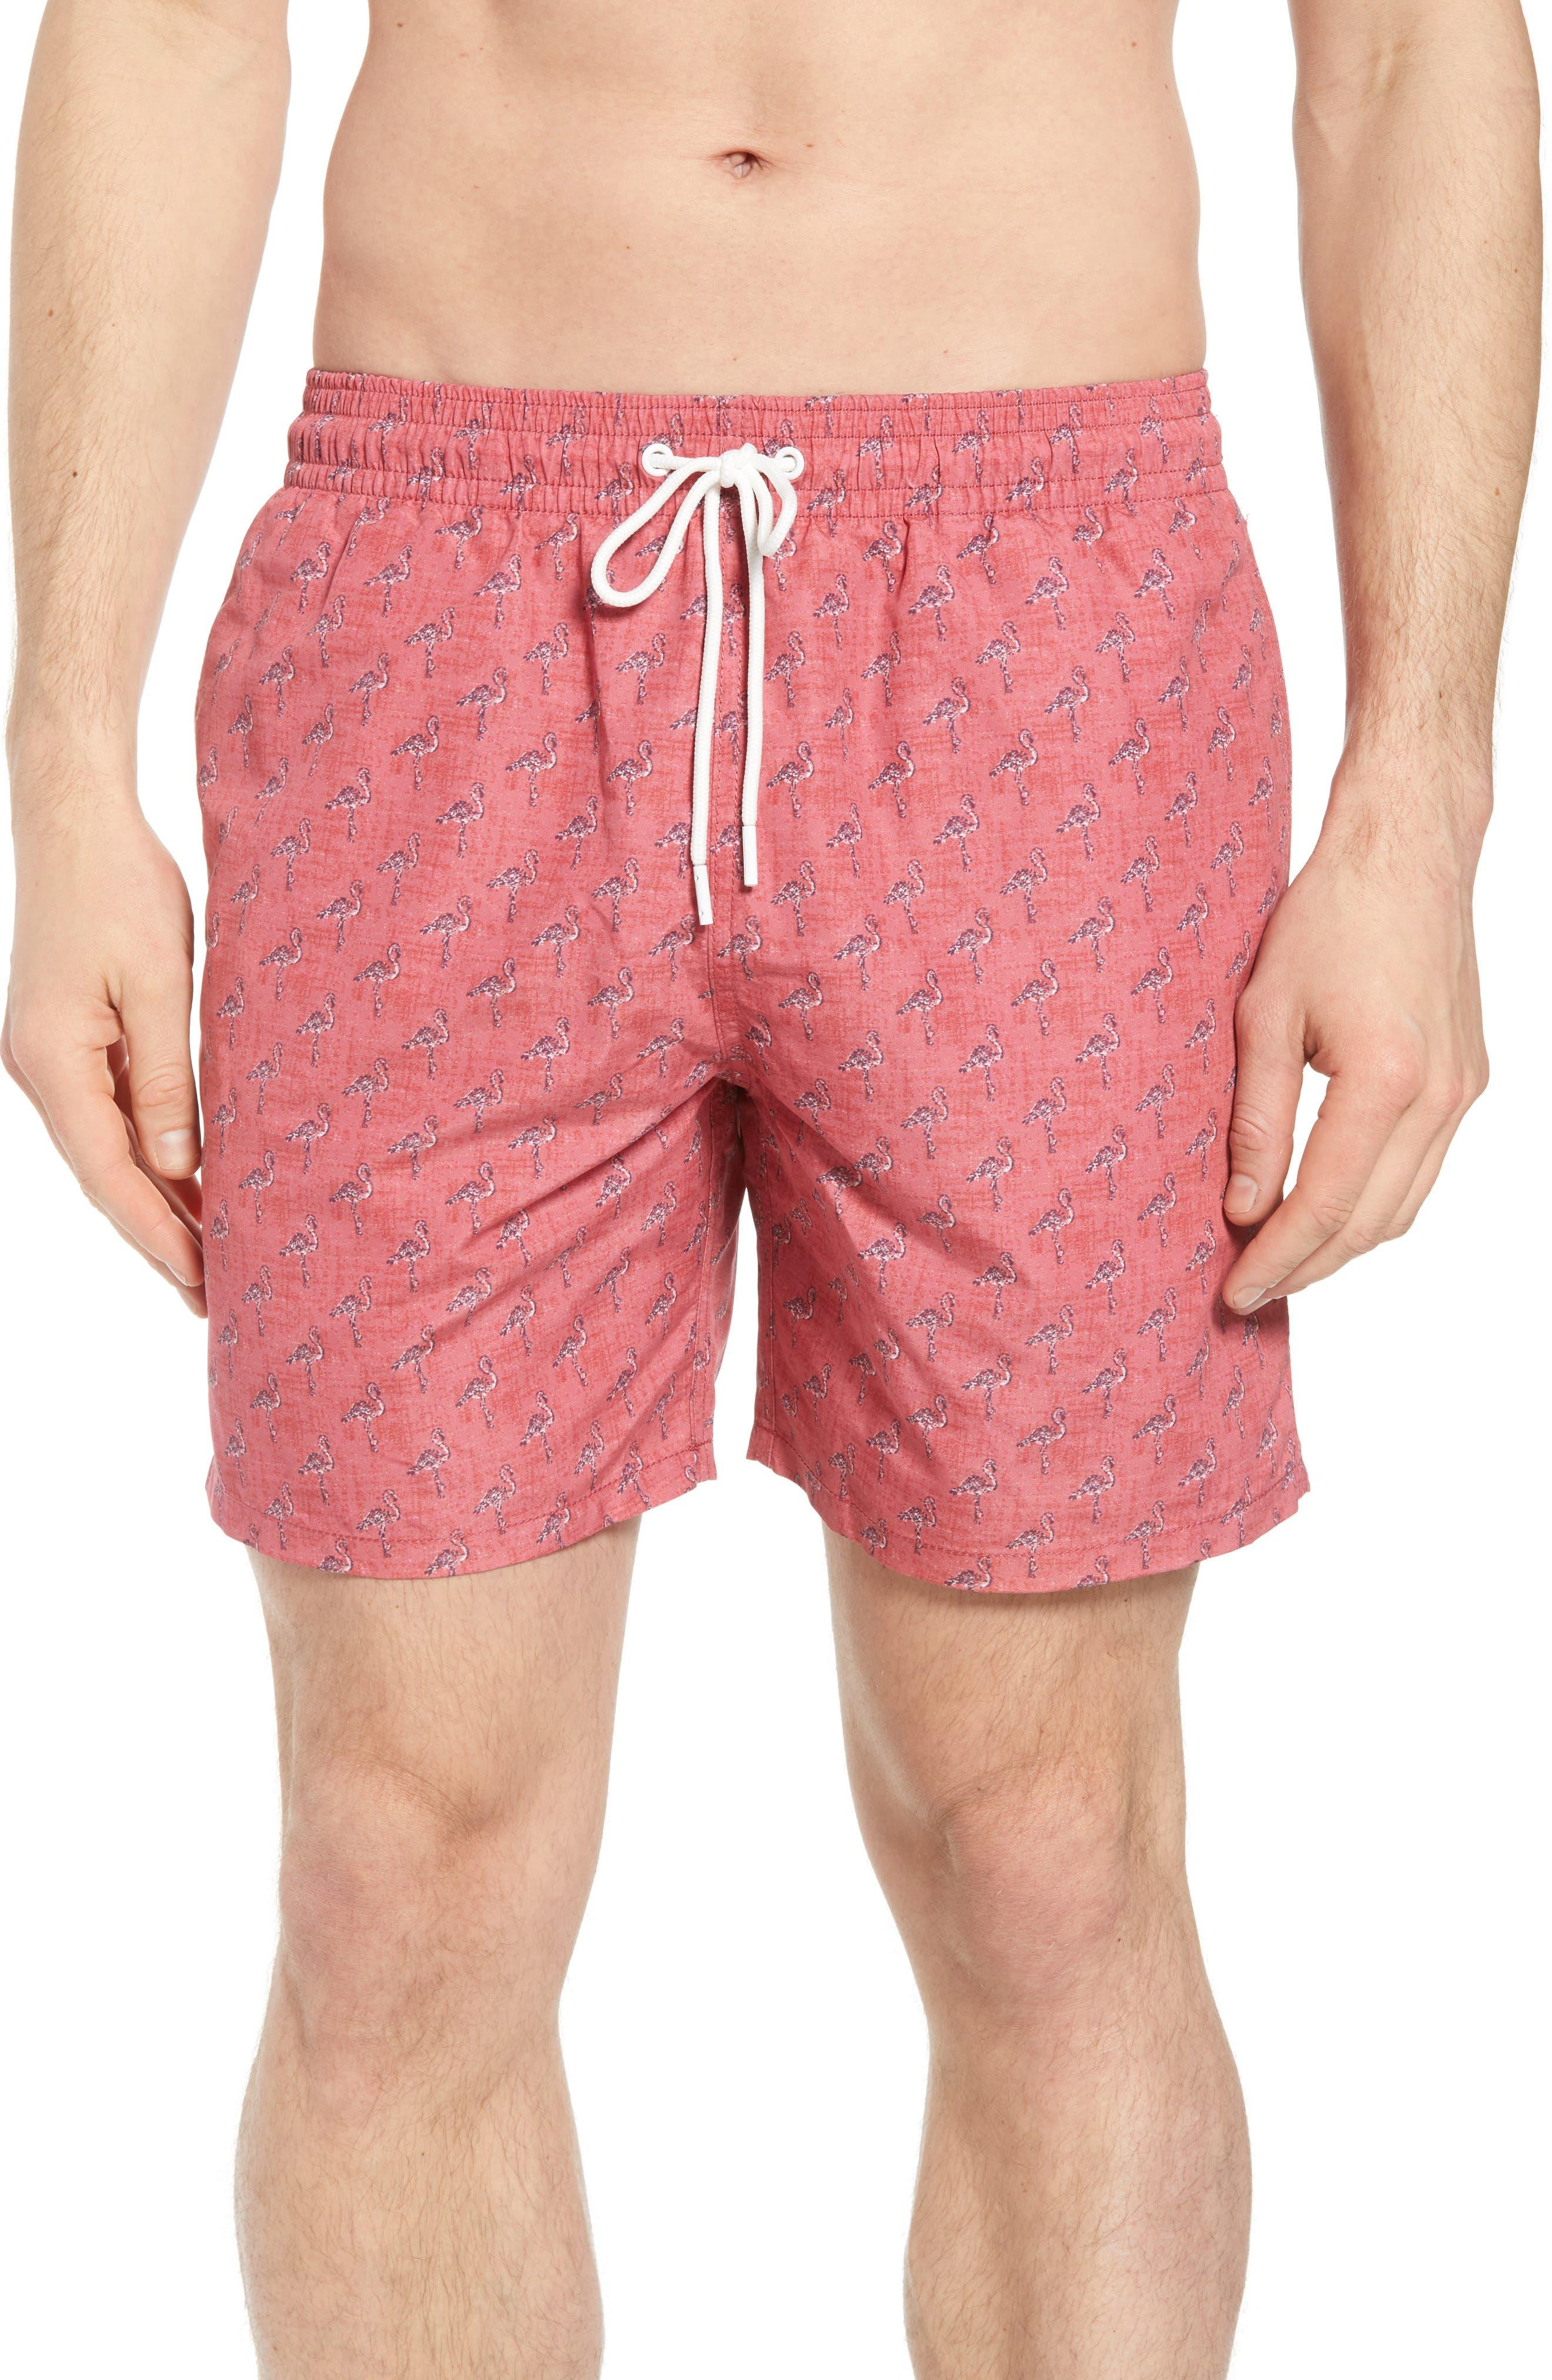 Dryden Regular Fit Print Swim Trunks,                         Main,                         color, Pomegranate